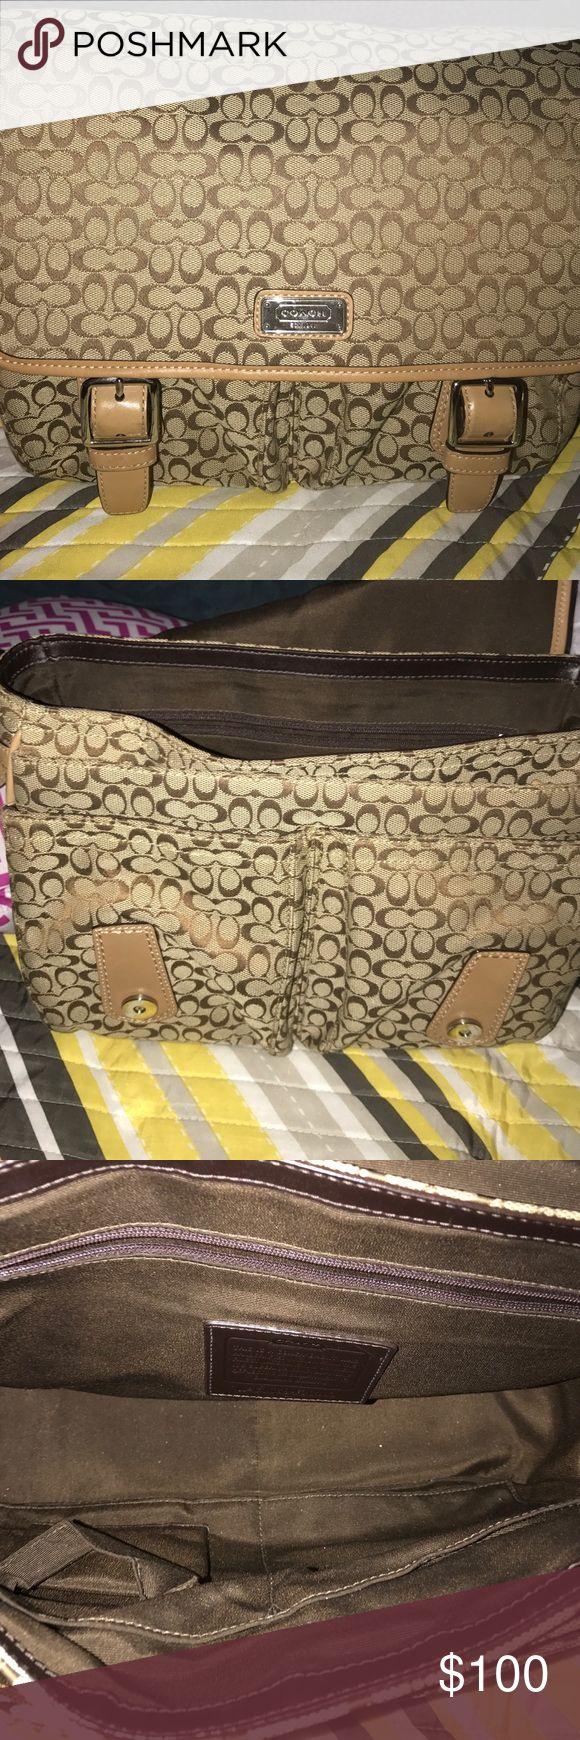 Coach messenger Bag Coach messenger bag! Pre-loved! Great for school, fits notebooks, laptops etc. Coach Bags Crossbody Bags